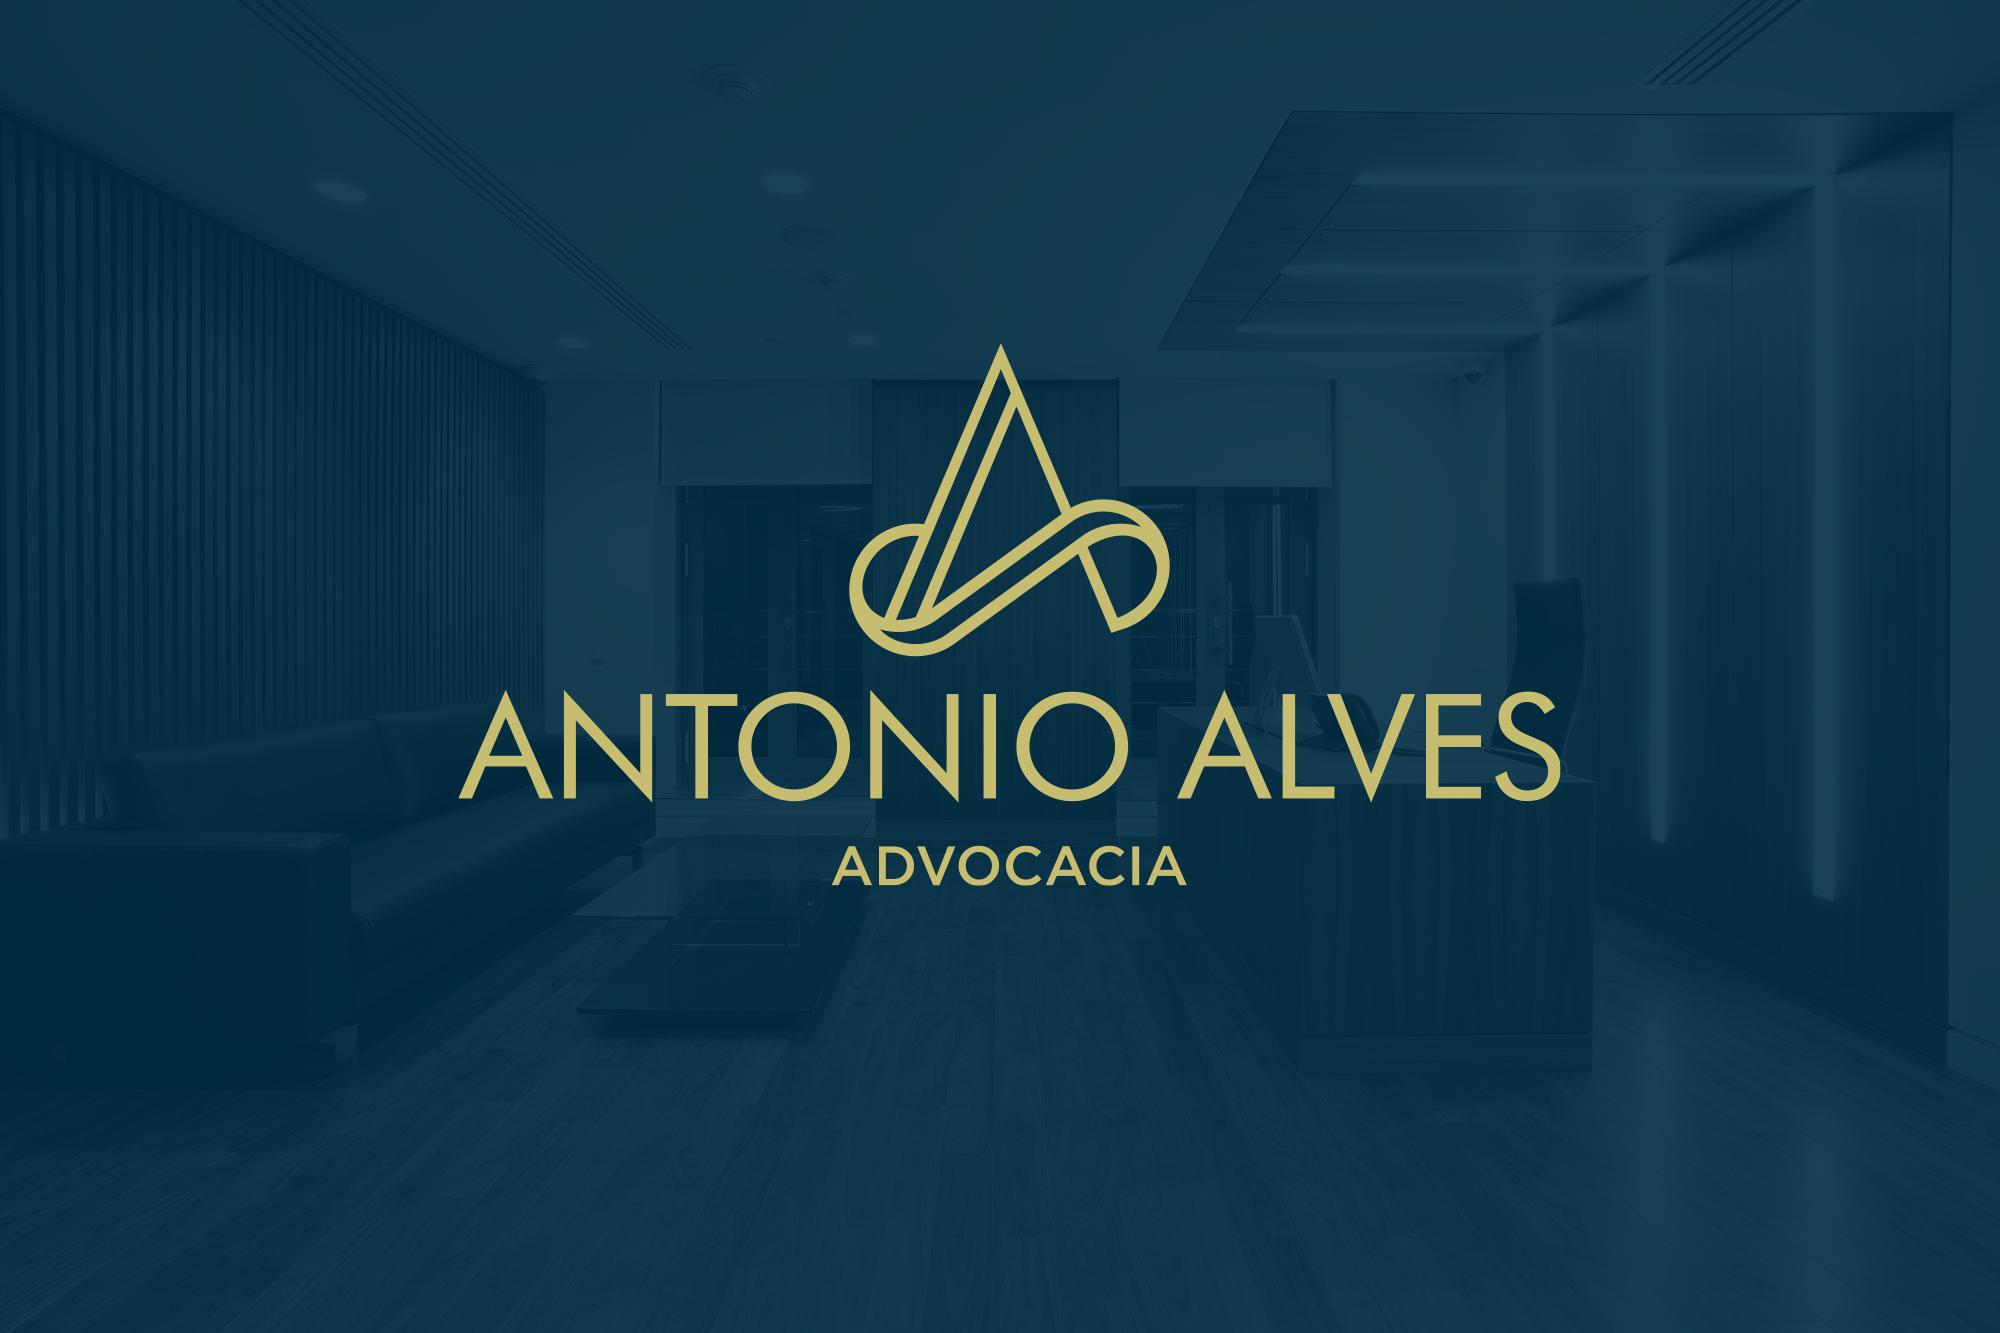 Antonio Alves Advocacia